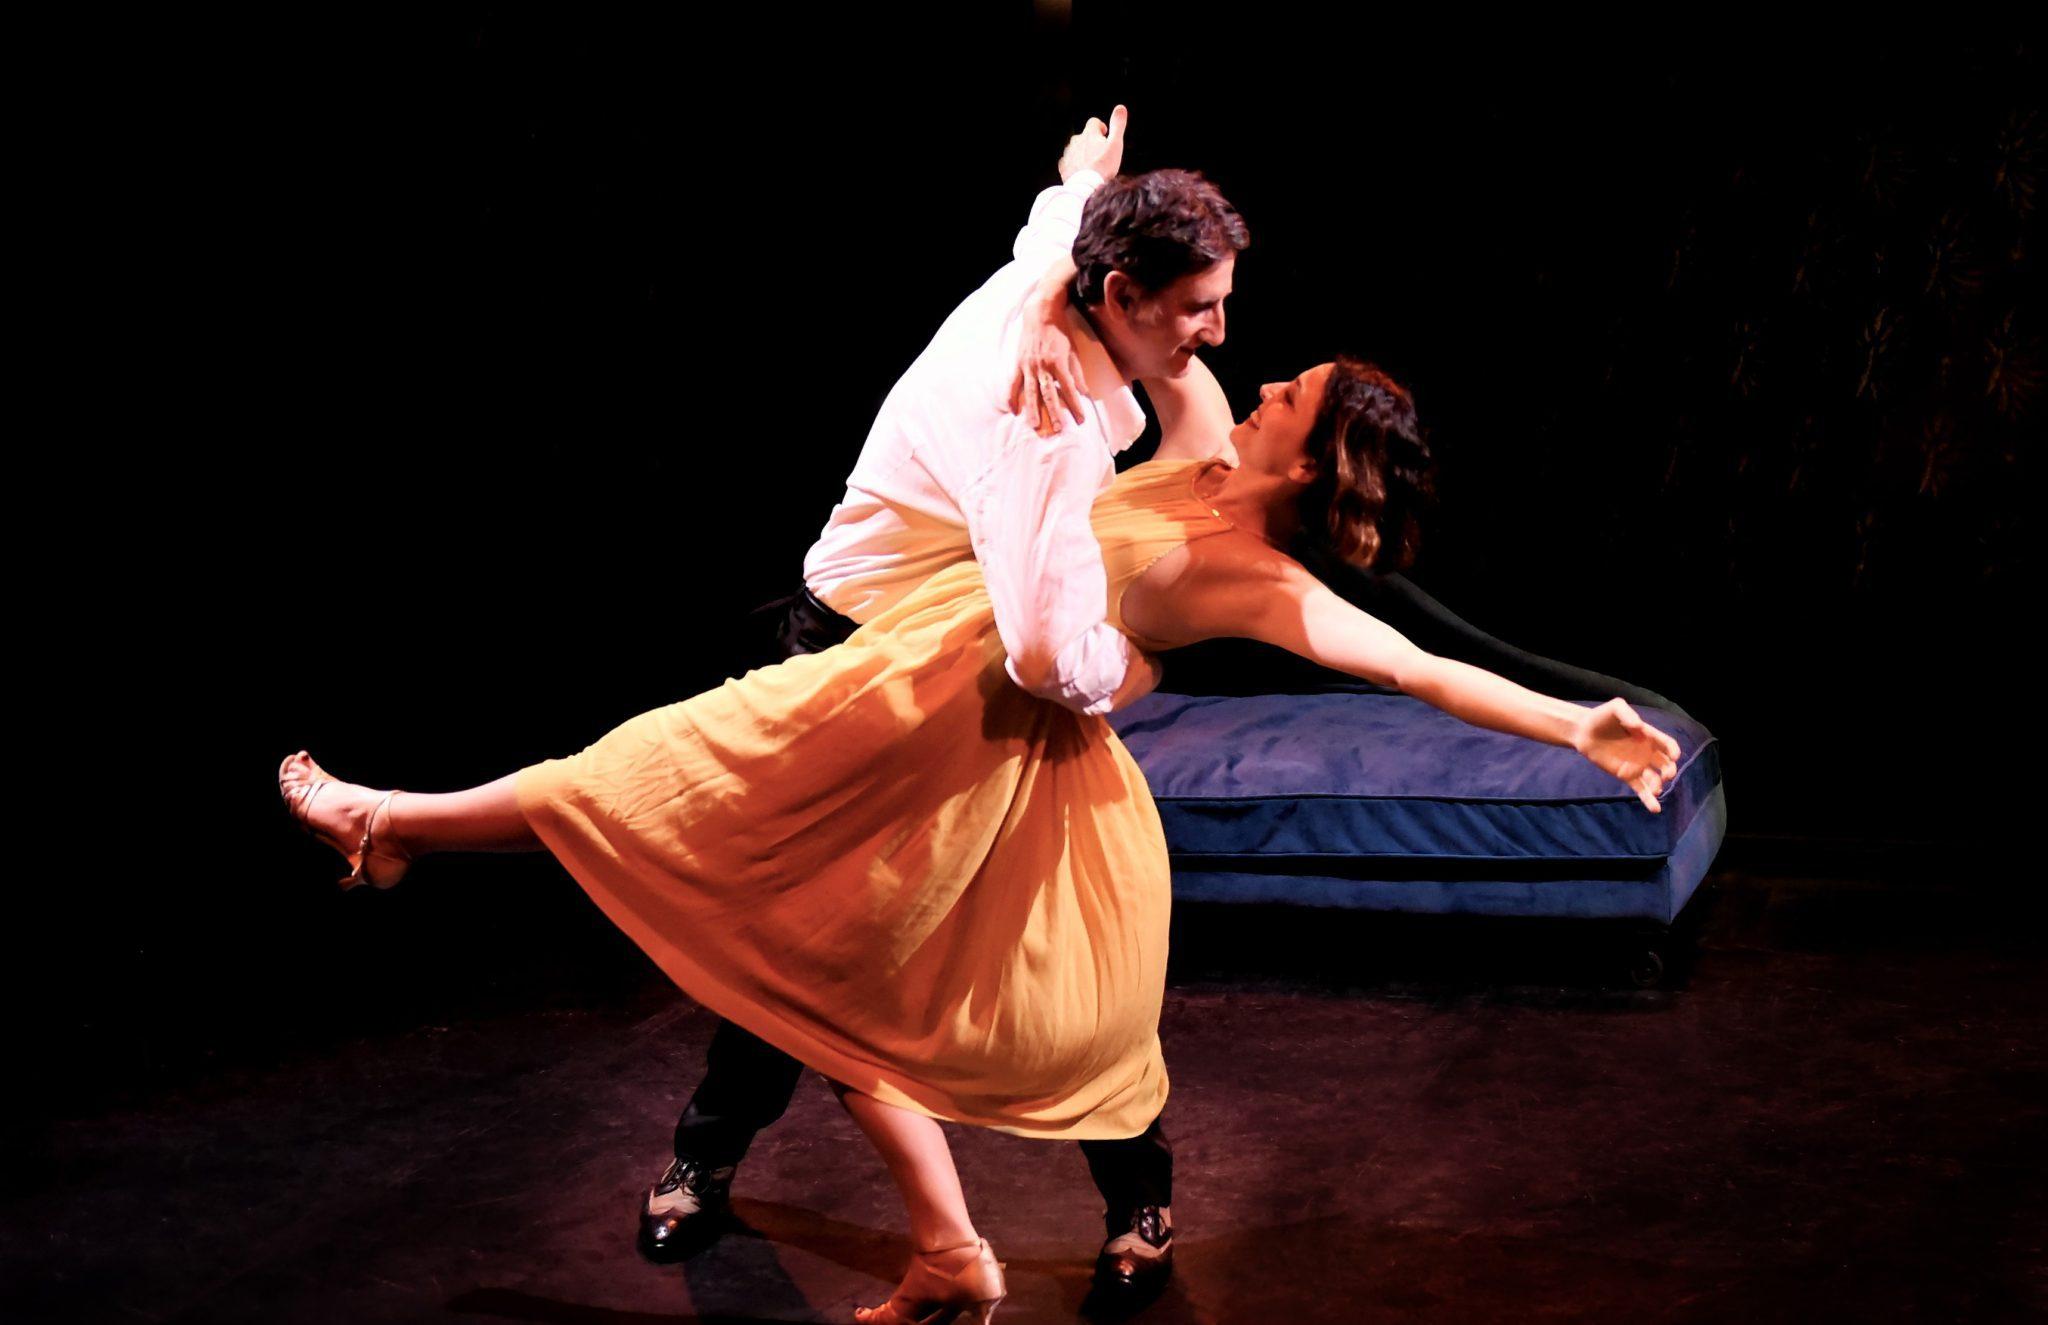 EN ATTENDANT BOJANGLES par Victoire BERGER PERRIN image danse (c) Evelyne Desaux